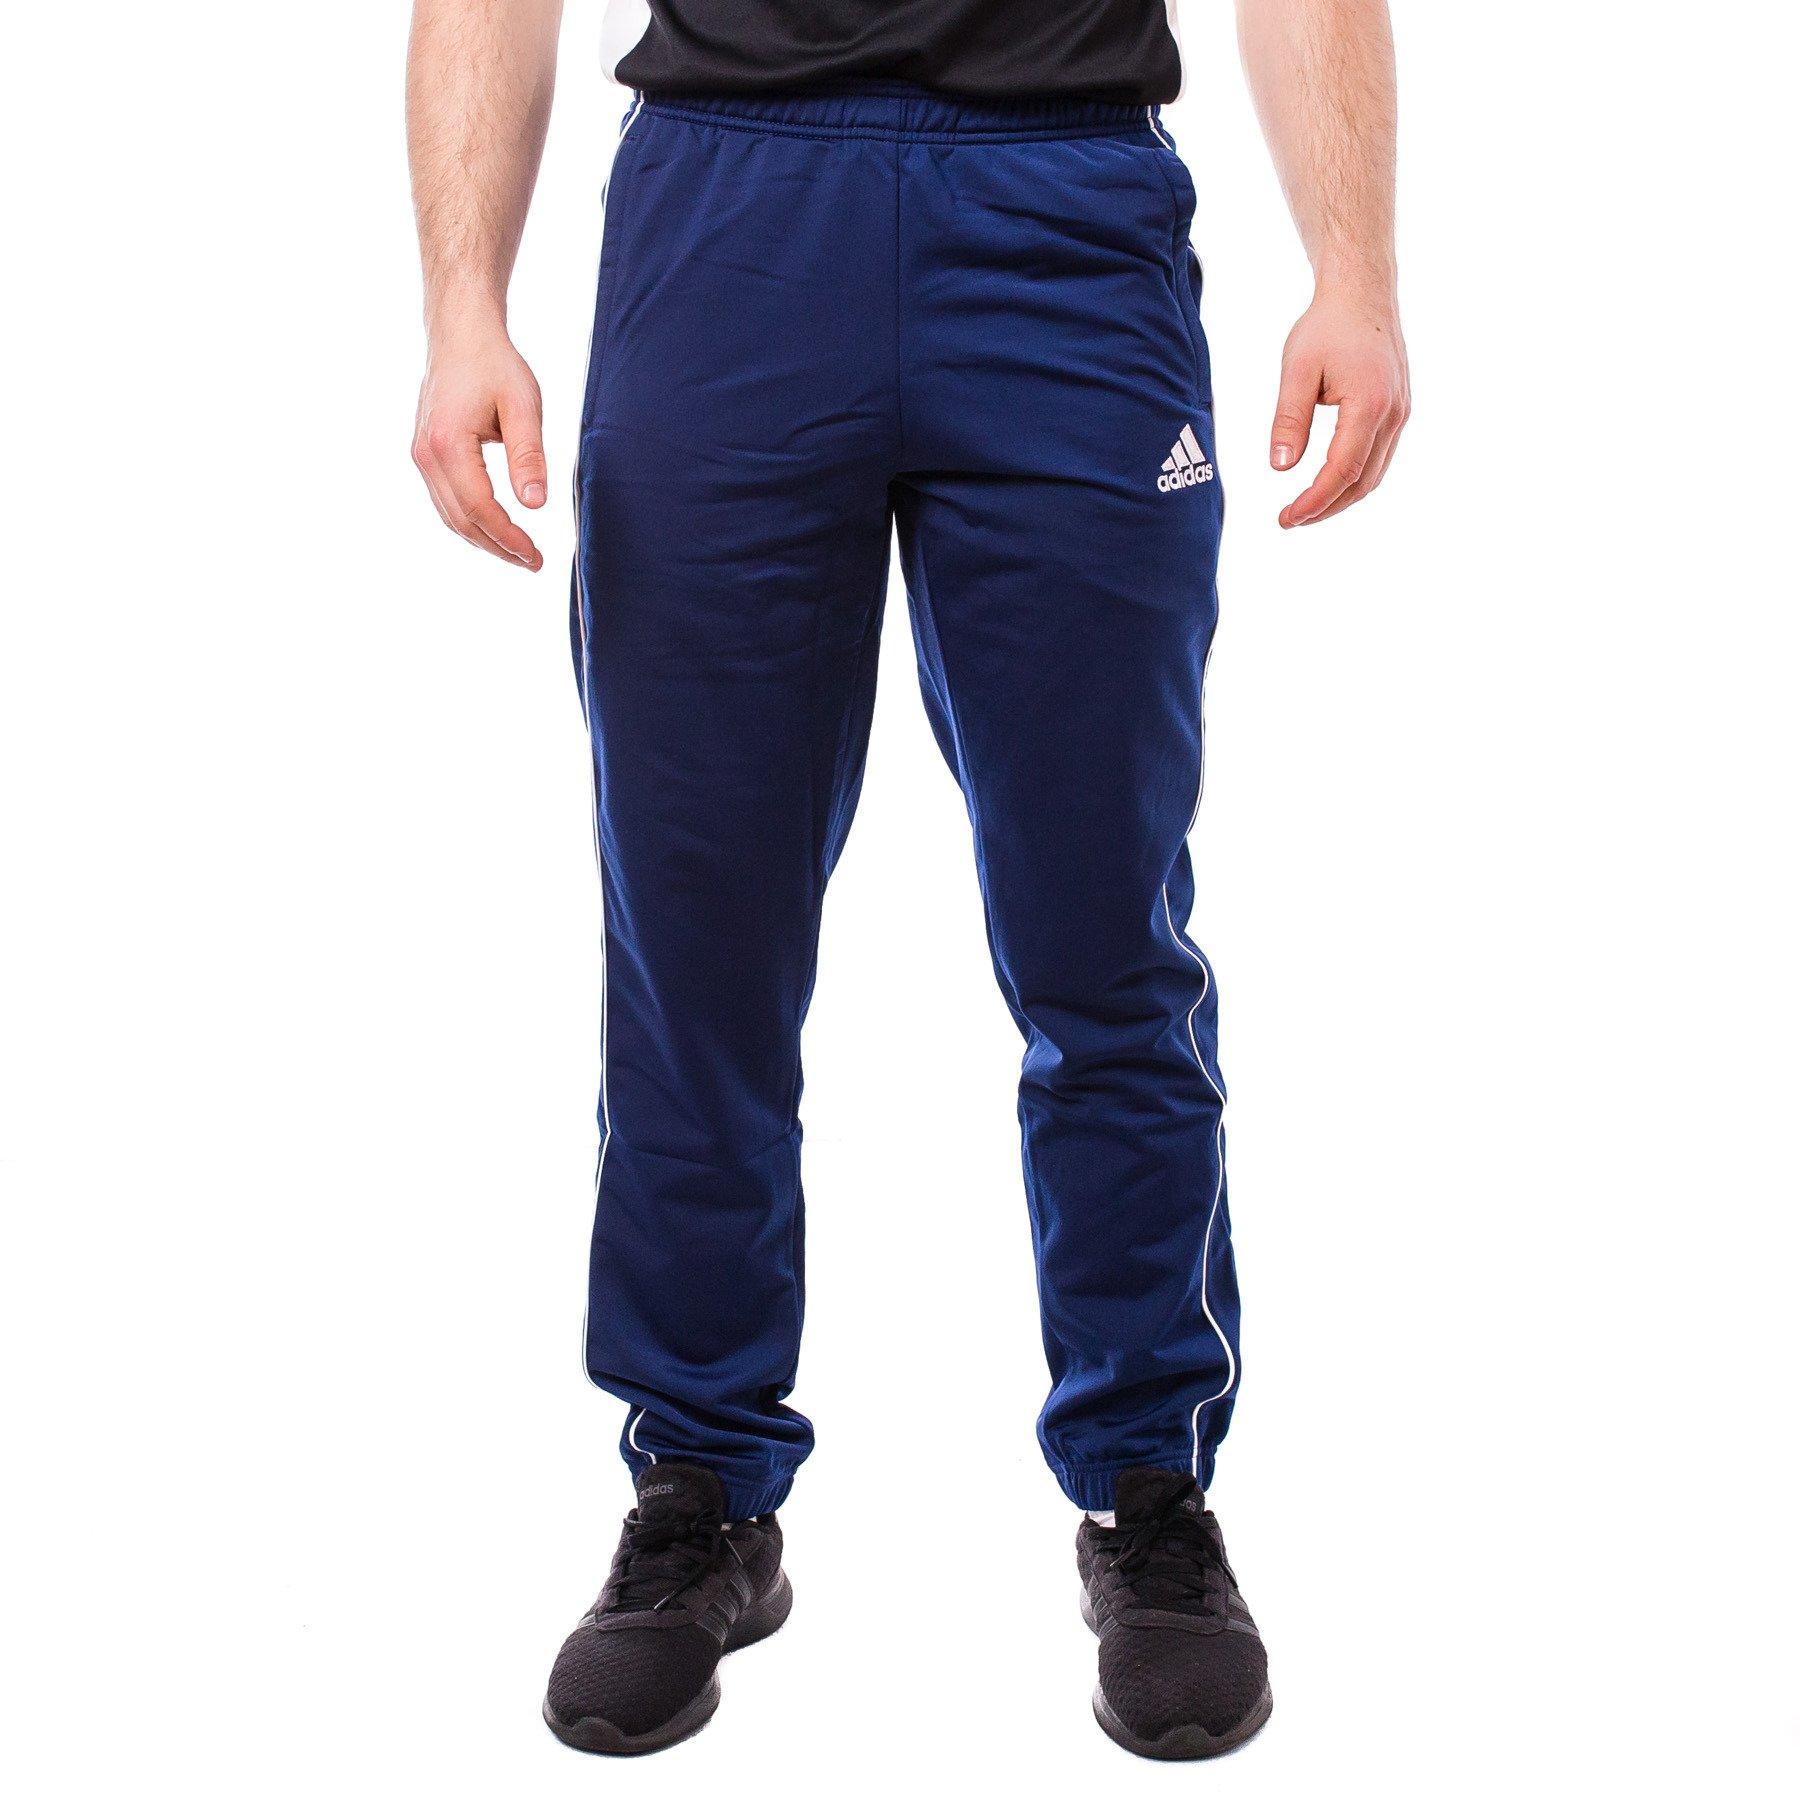 0427f2fcb5625d Męskie spodnie dresowe Adidas, granatowe - CORE 18 CV3585| Sklep ...